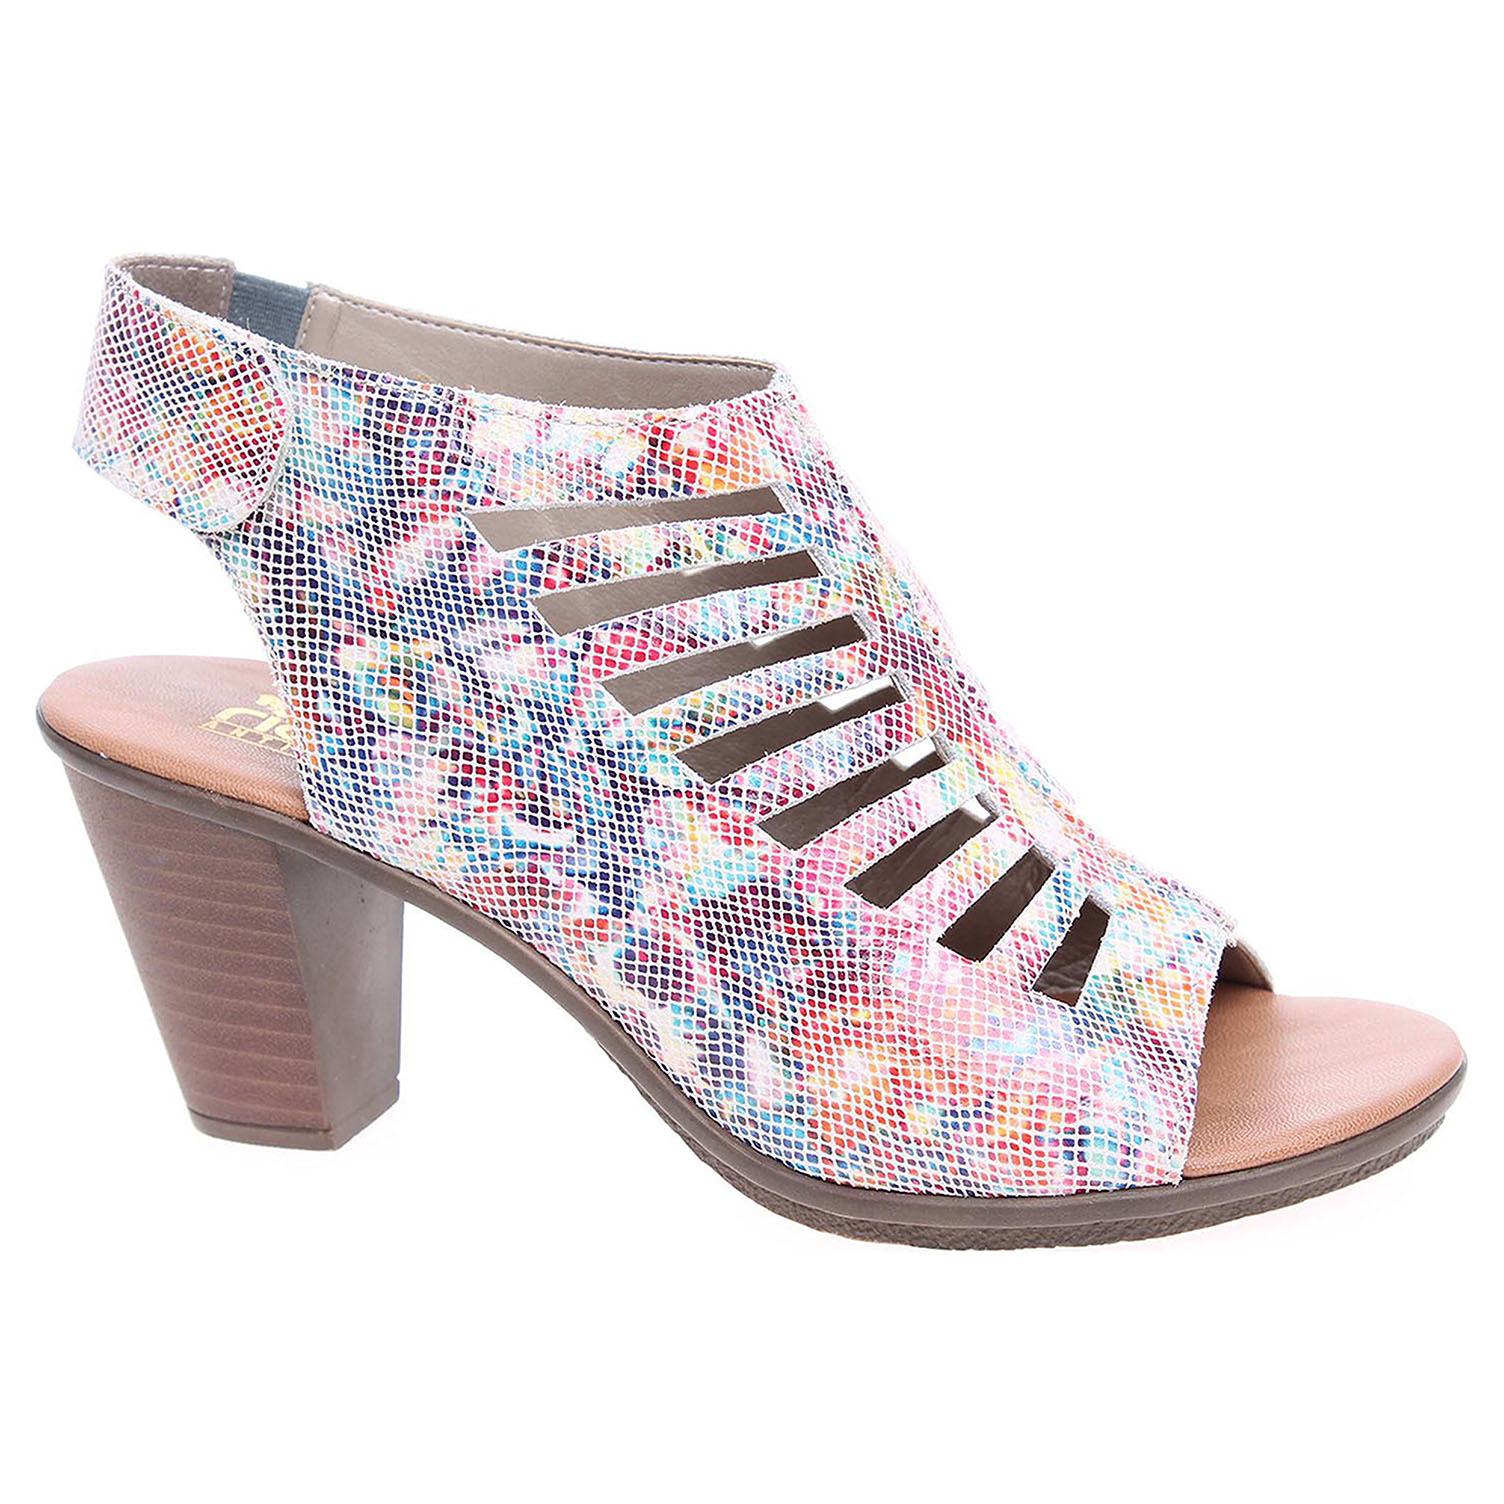 aa39b0c99d9f4 Dámske sandále Rieker 64195-90 multi   REJNOK obuv